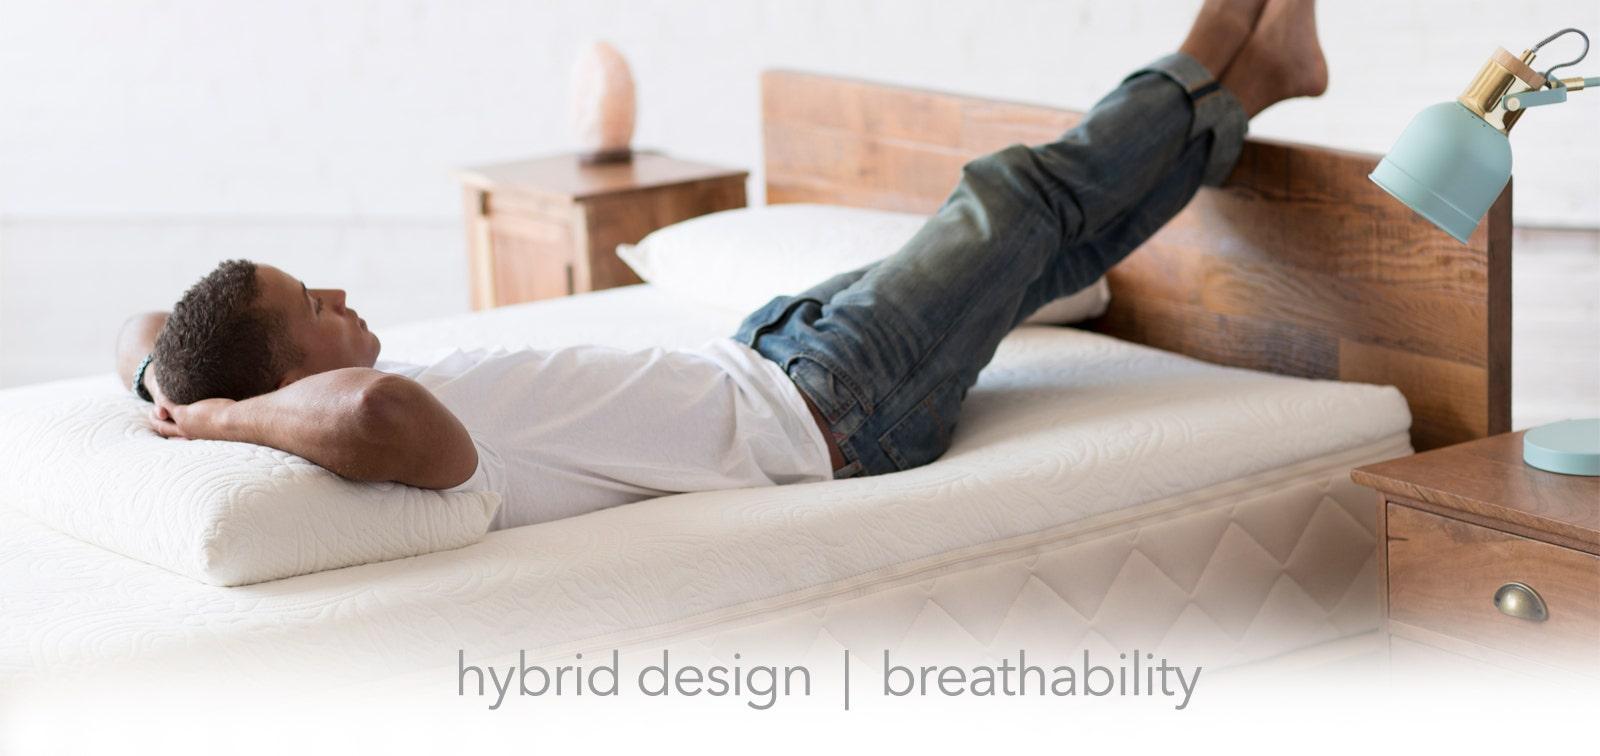 Man Resting On Mattress